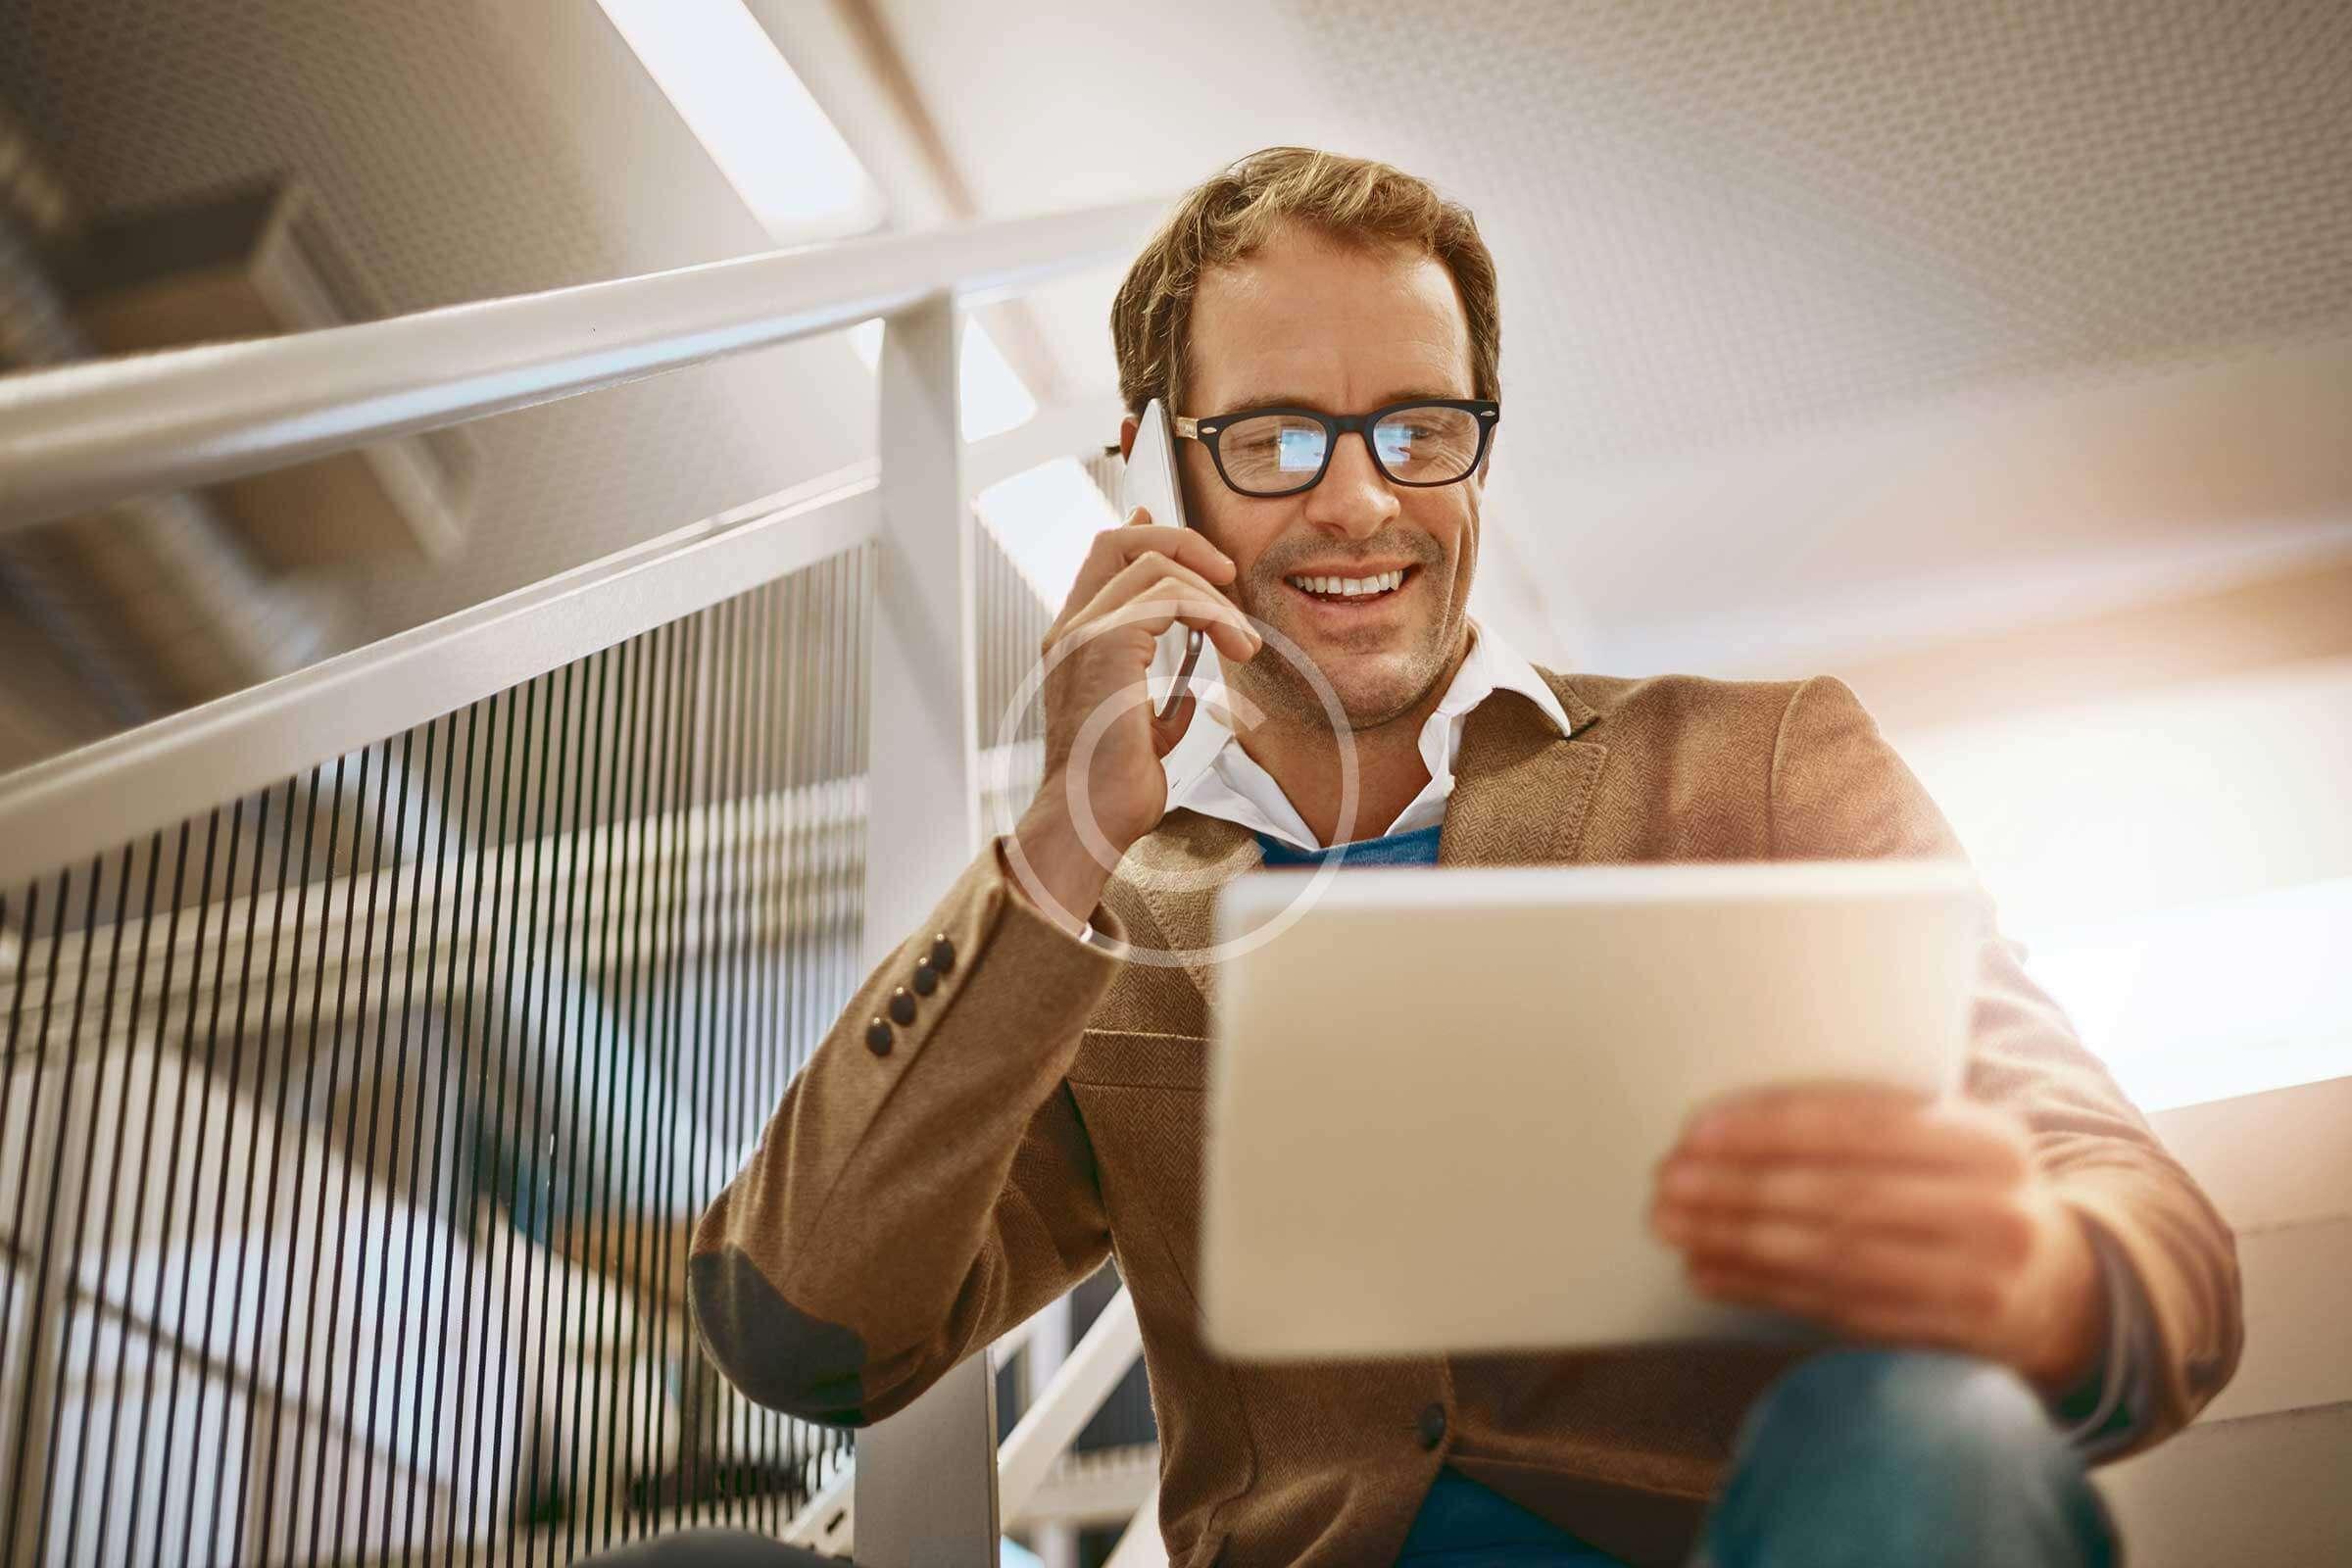 The Shifting Boundaries of Digital Business